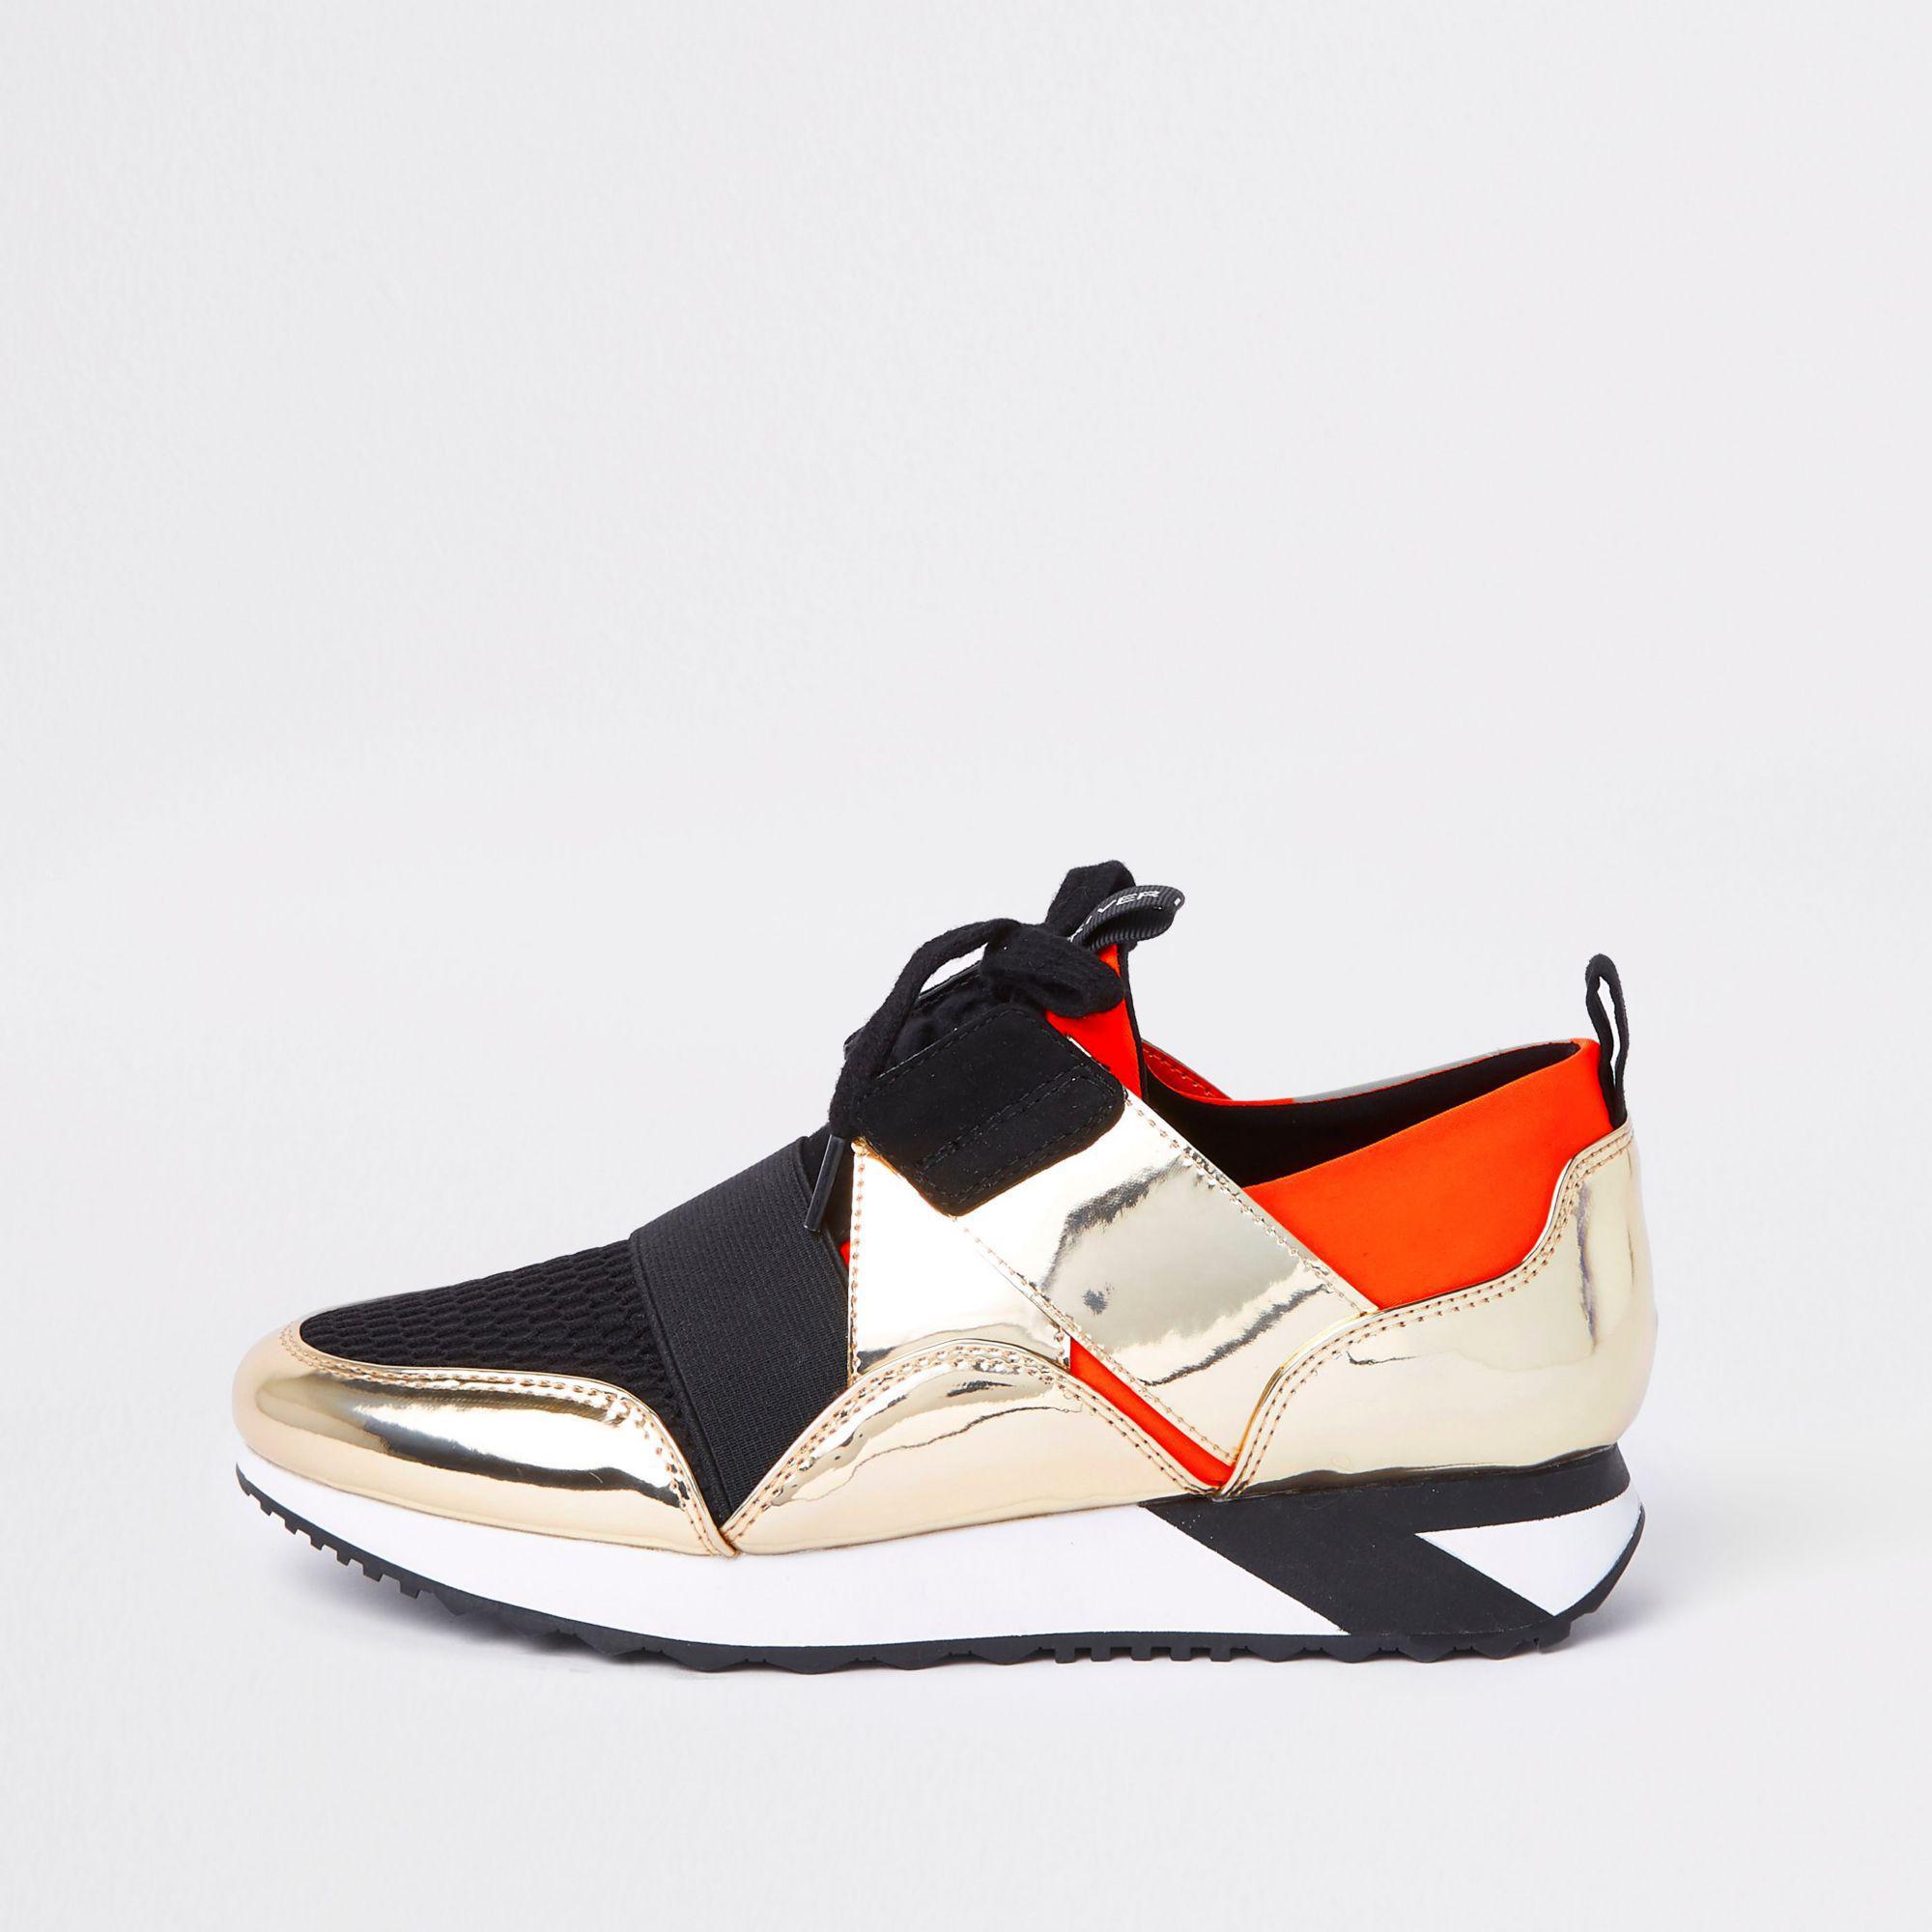 hot sales 190c1 cfae3 river-island-Orange-Elastic-Lace-up-Runner-Sneakers.jpeg